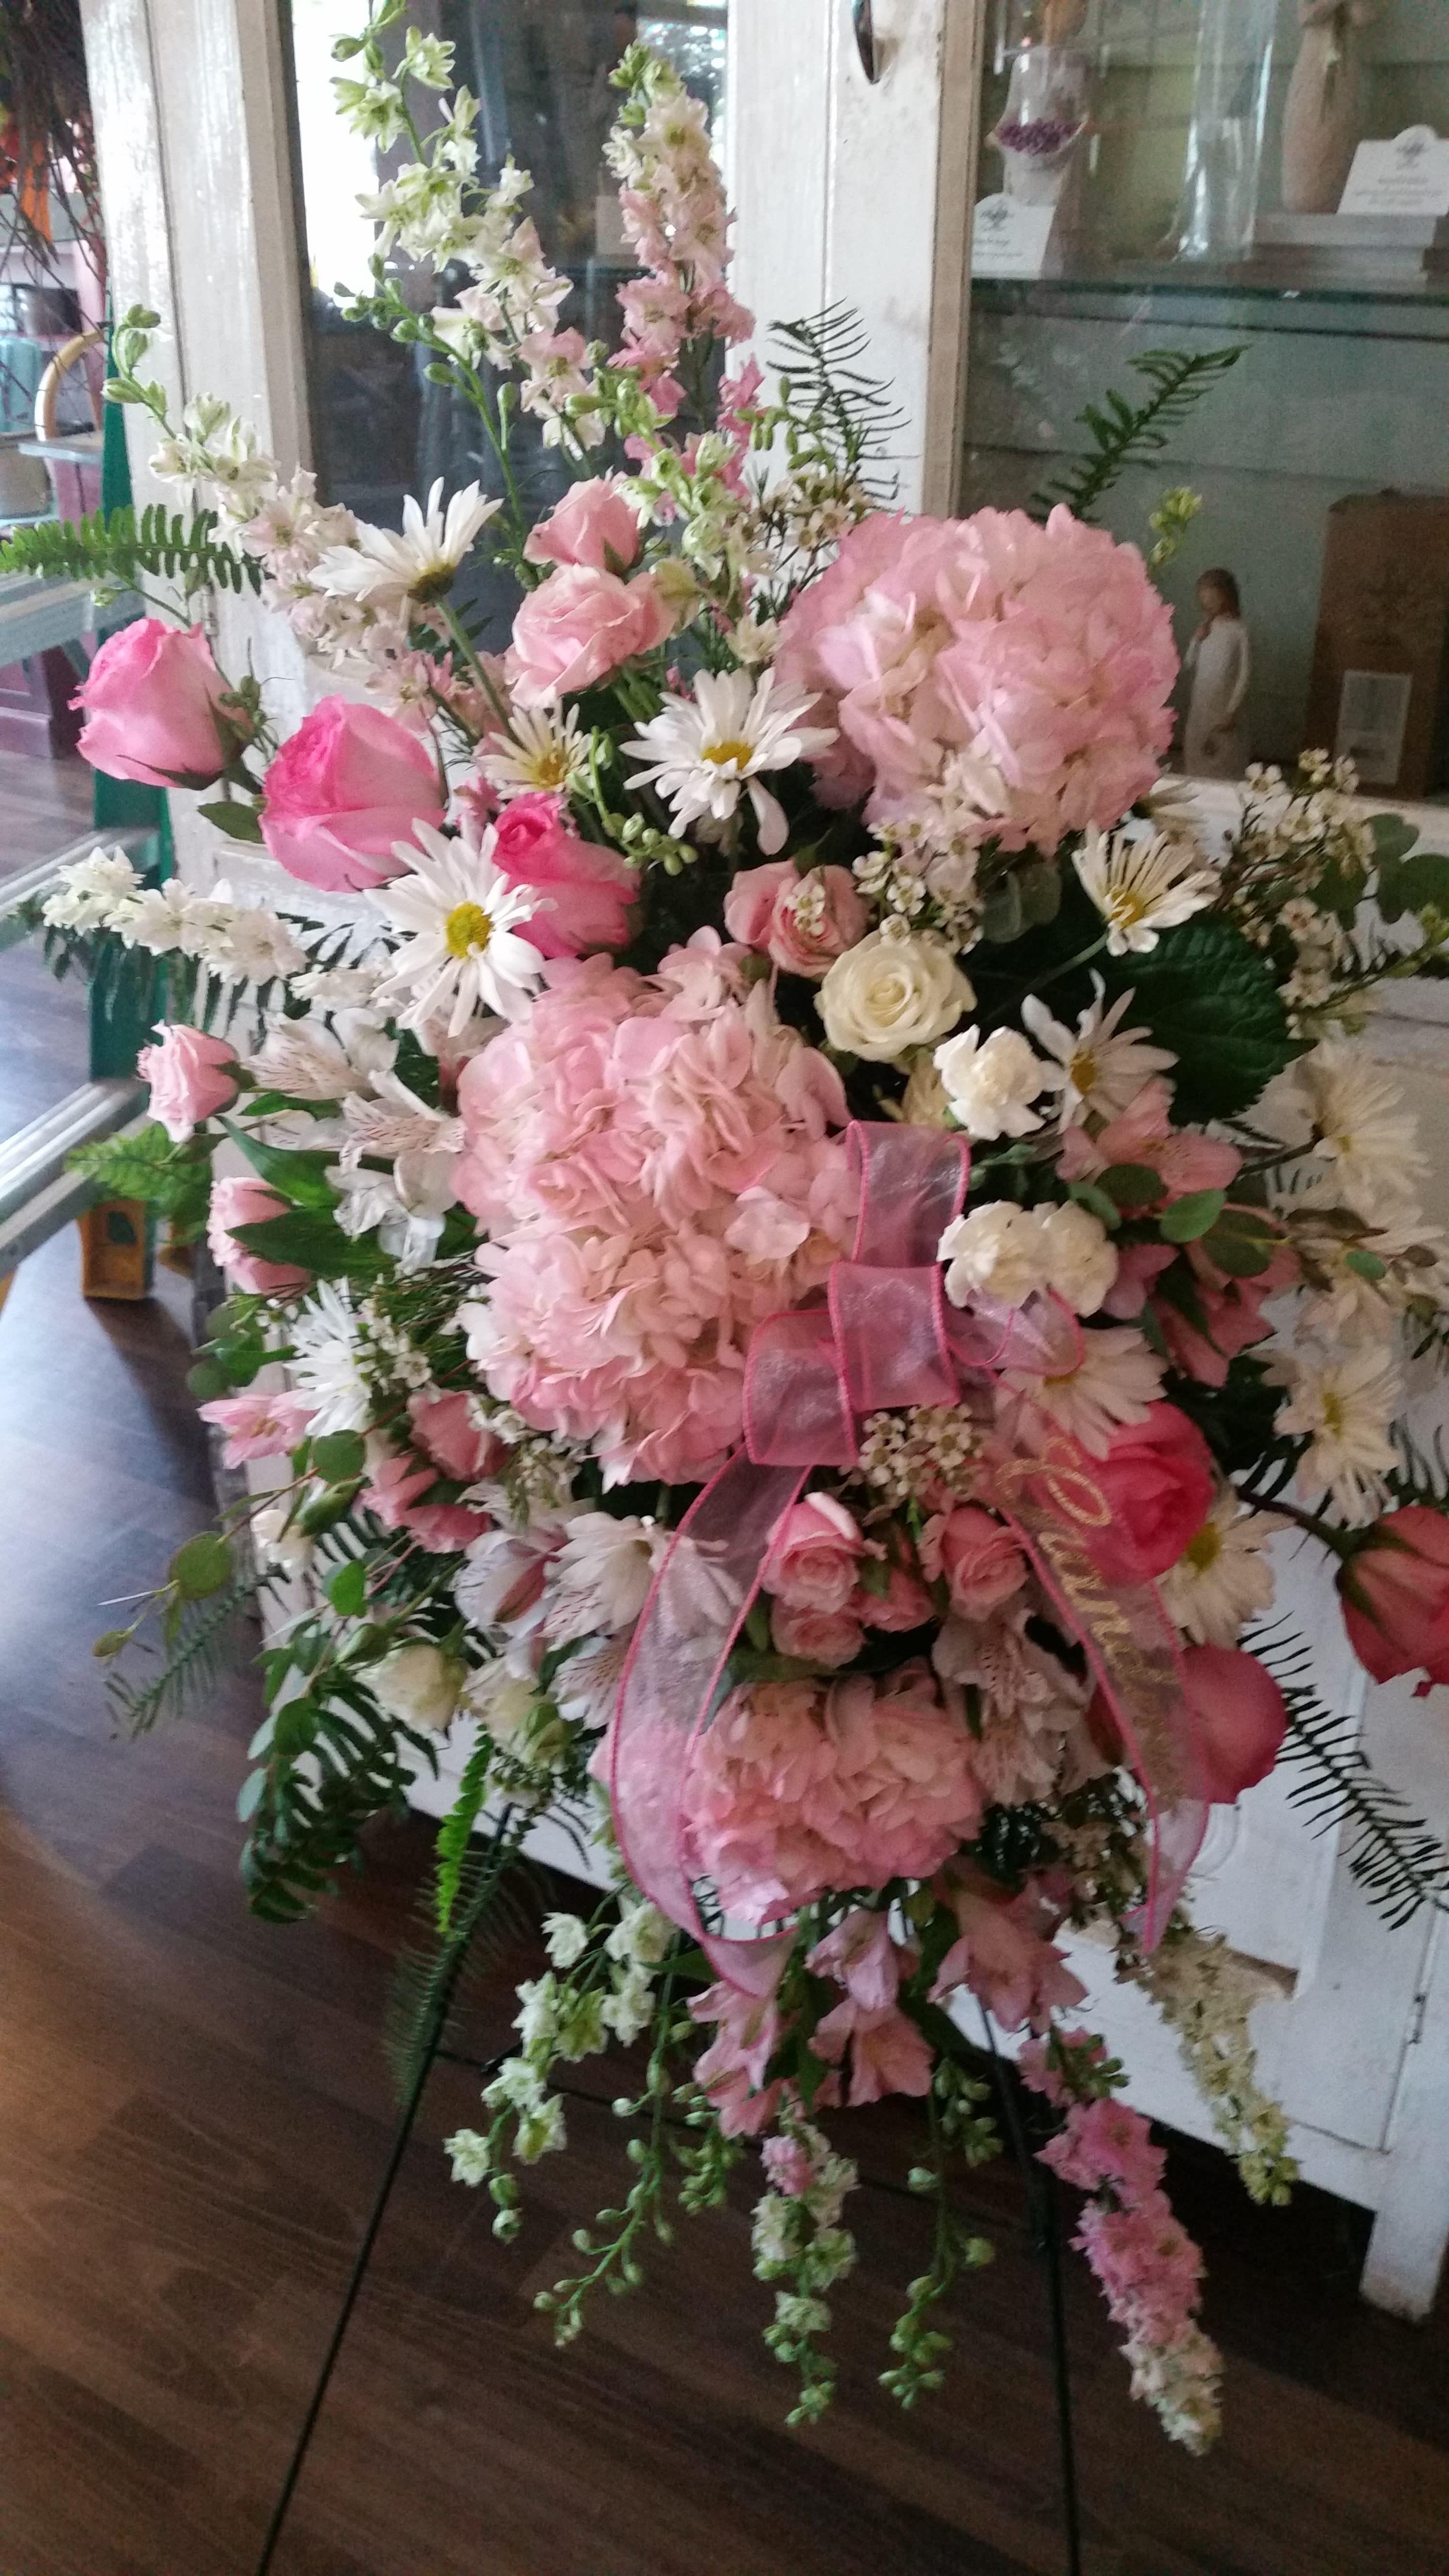 Heartfelt Memories In Keokuk Ia Willow Tree Flowers Gifts